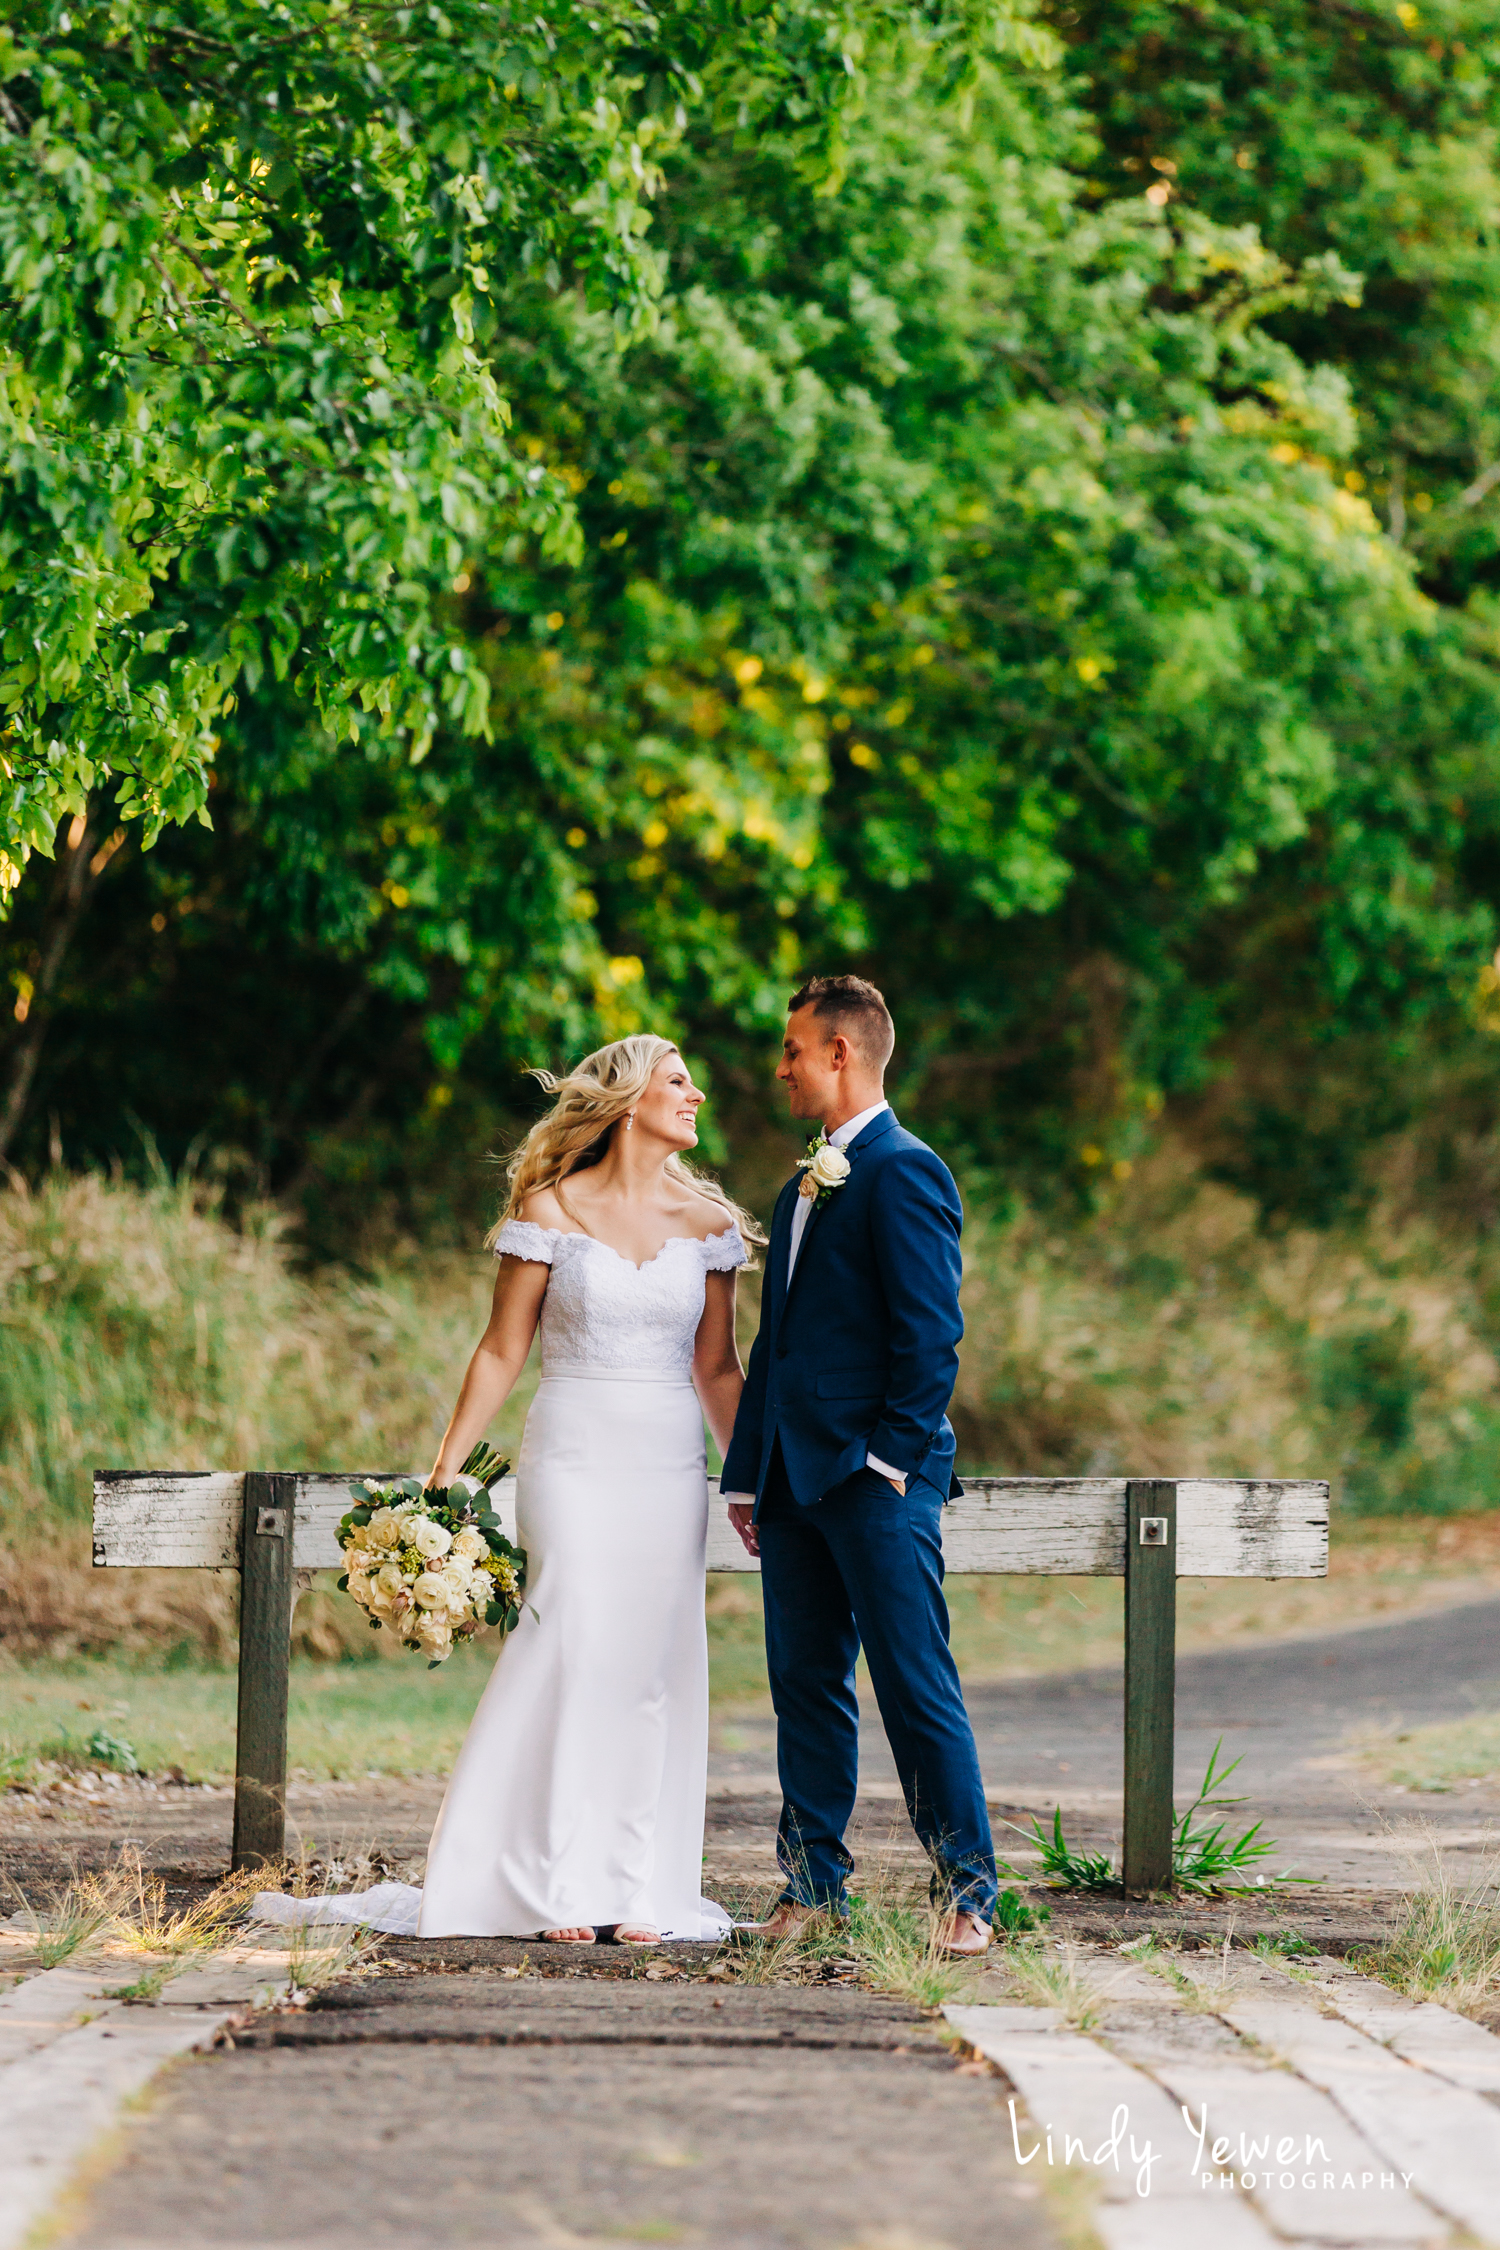 Wedding Photographers Sunshine Coast Lindy Yewen.jpg